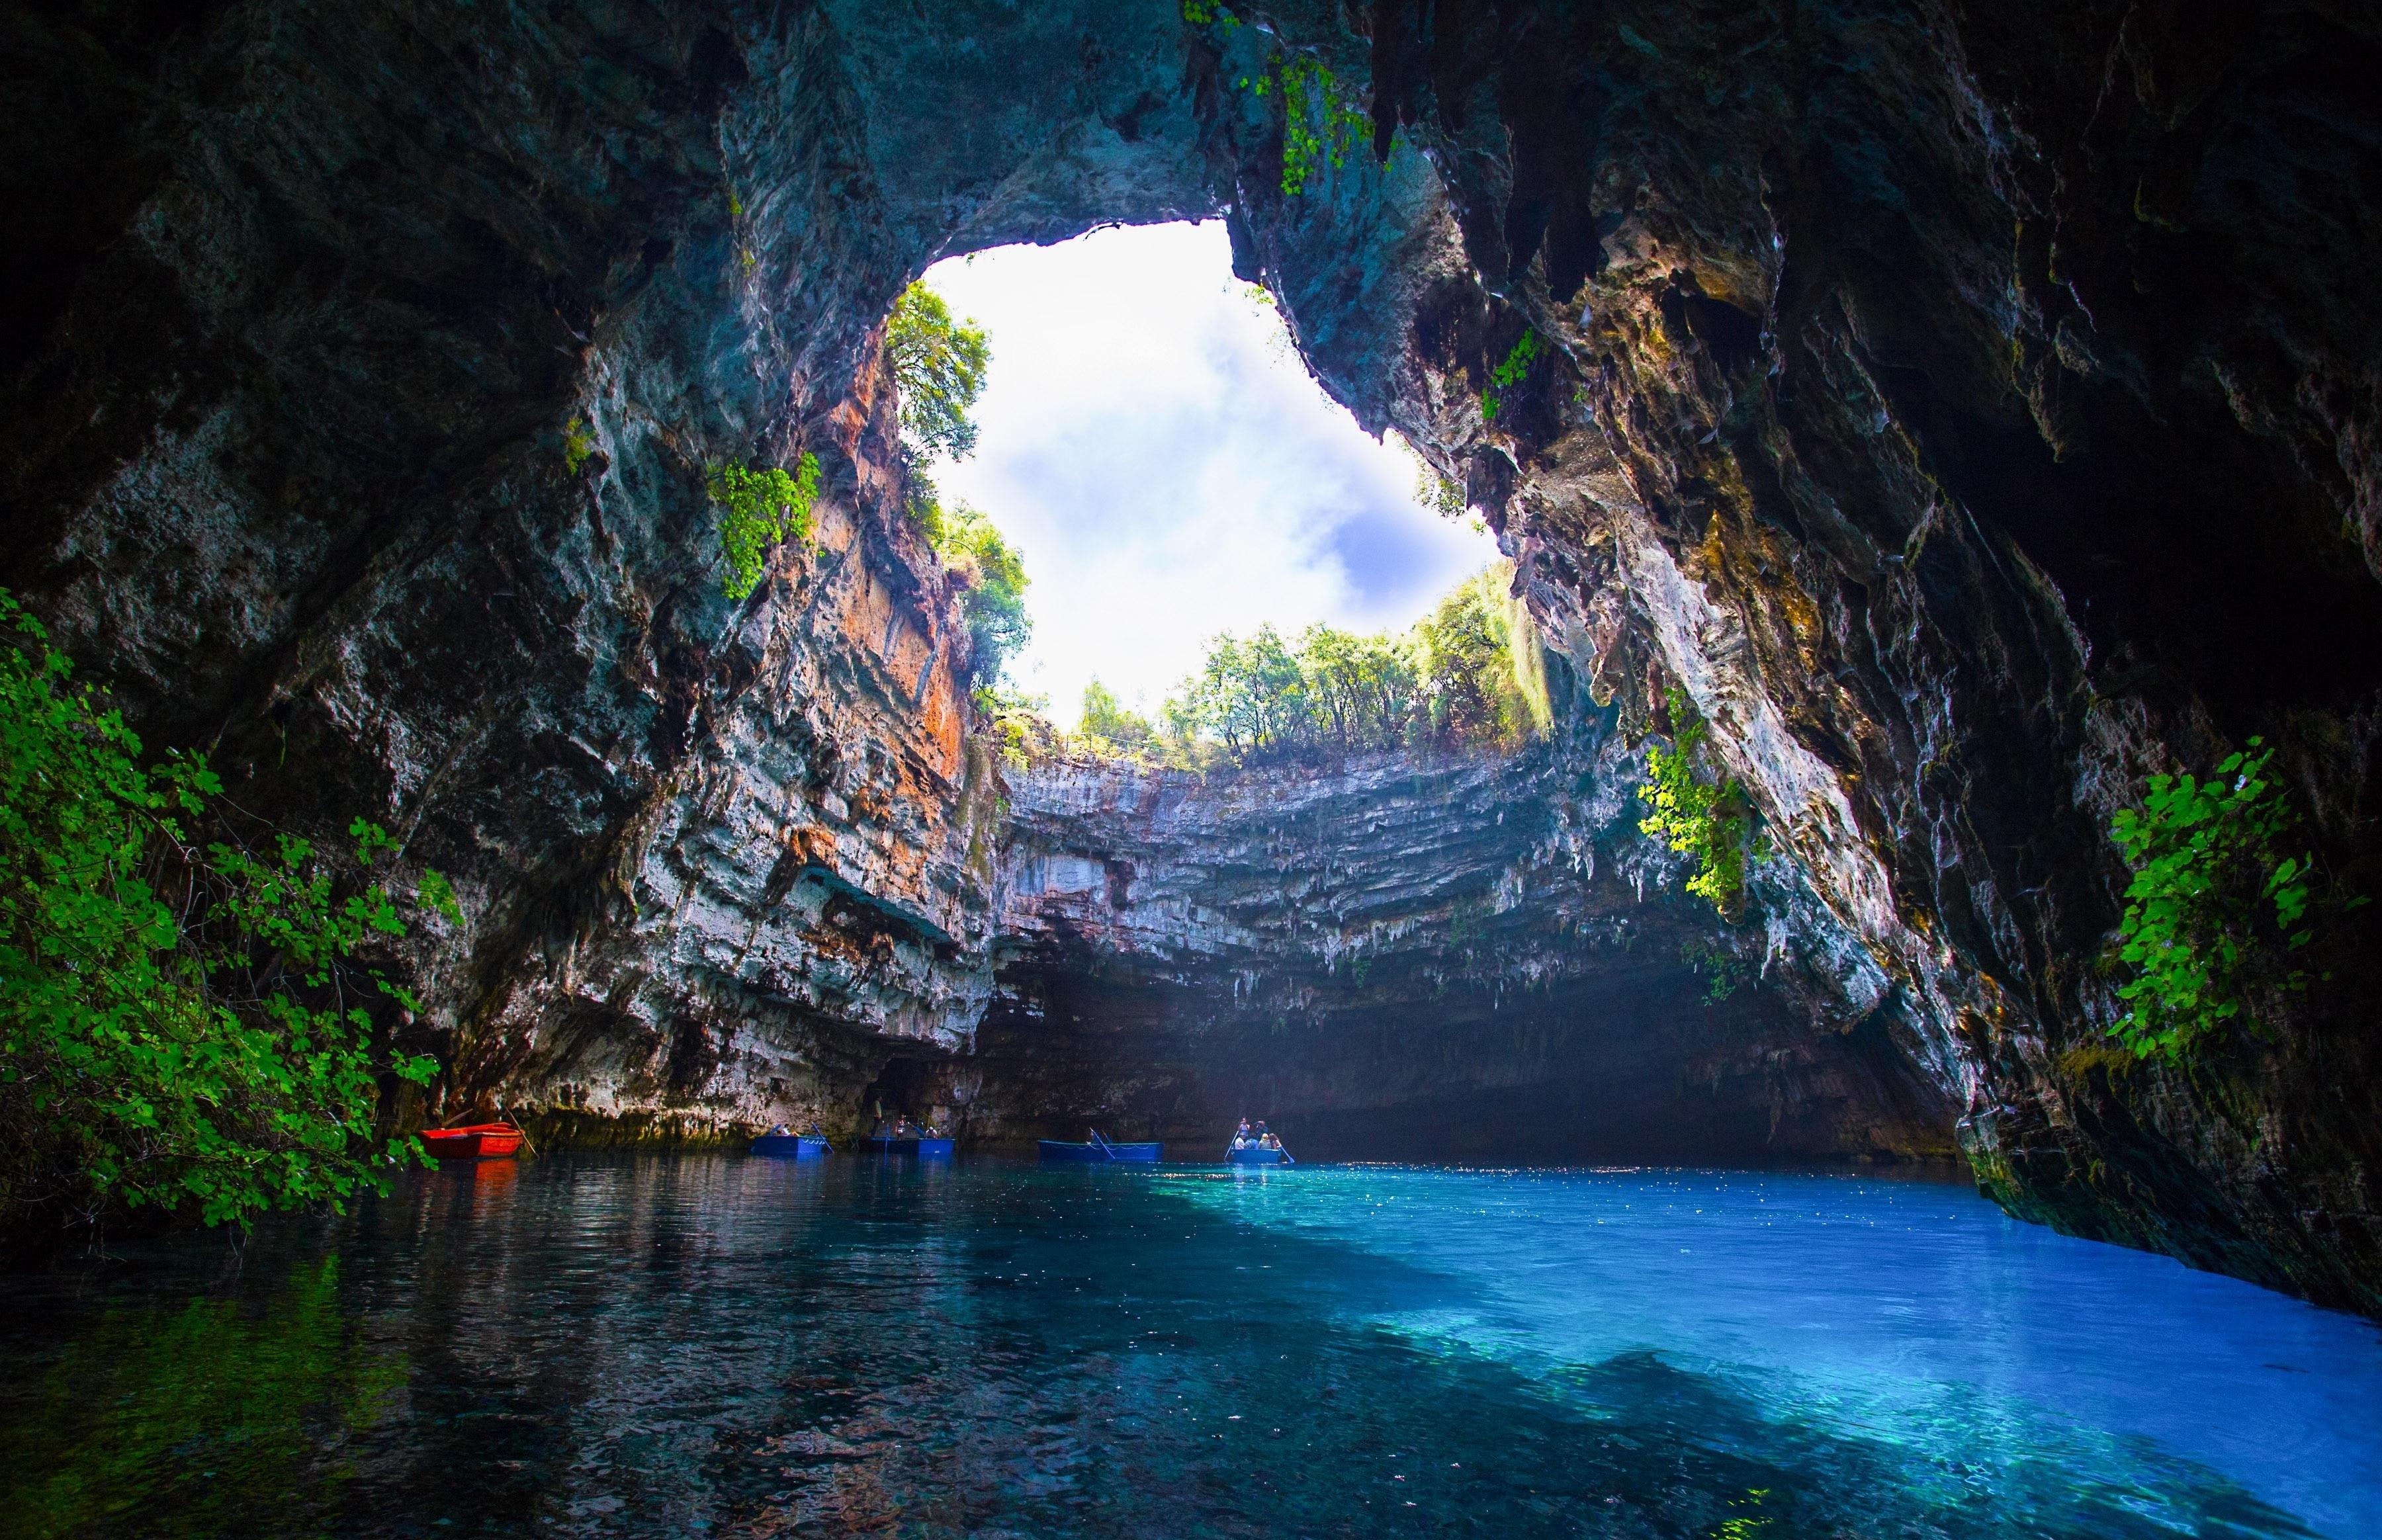 Melissani Cave Lake, Kefalonia, Ionian Islands Region, Greece